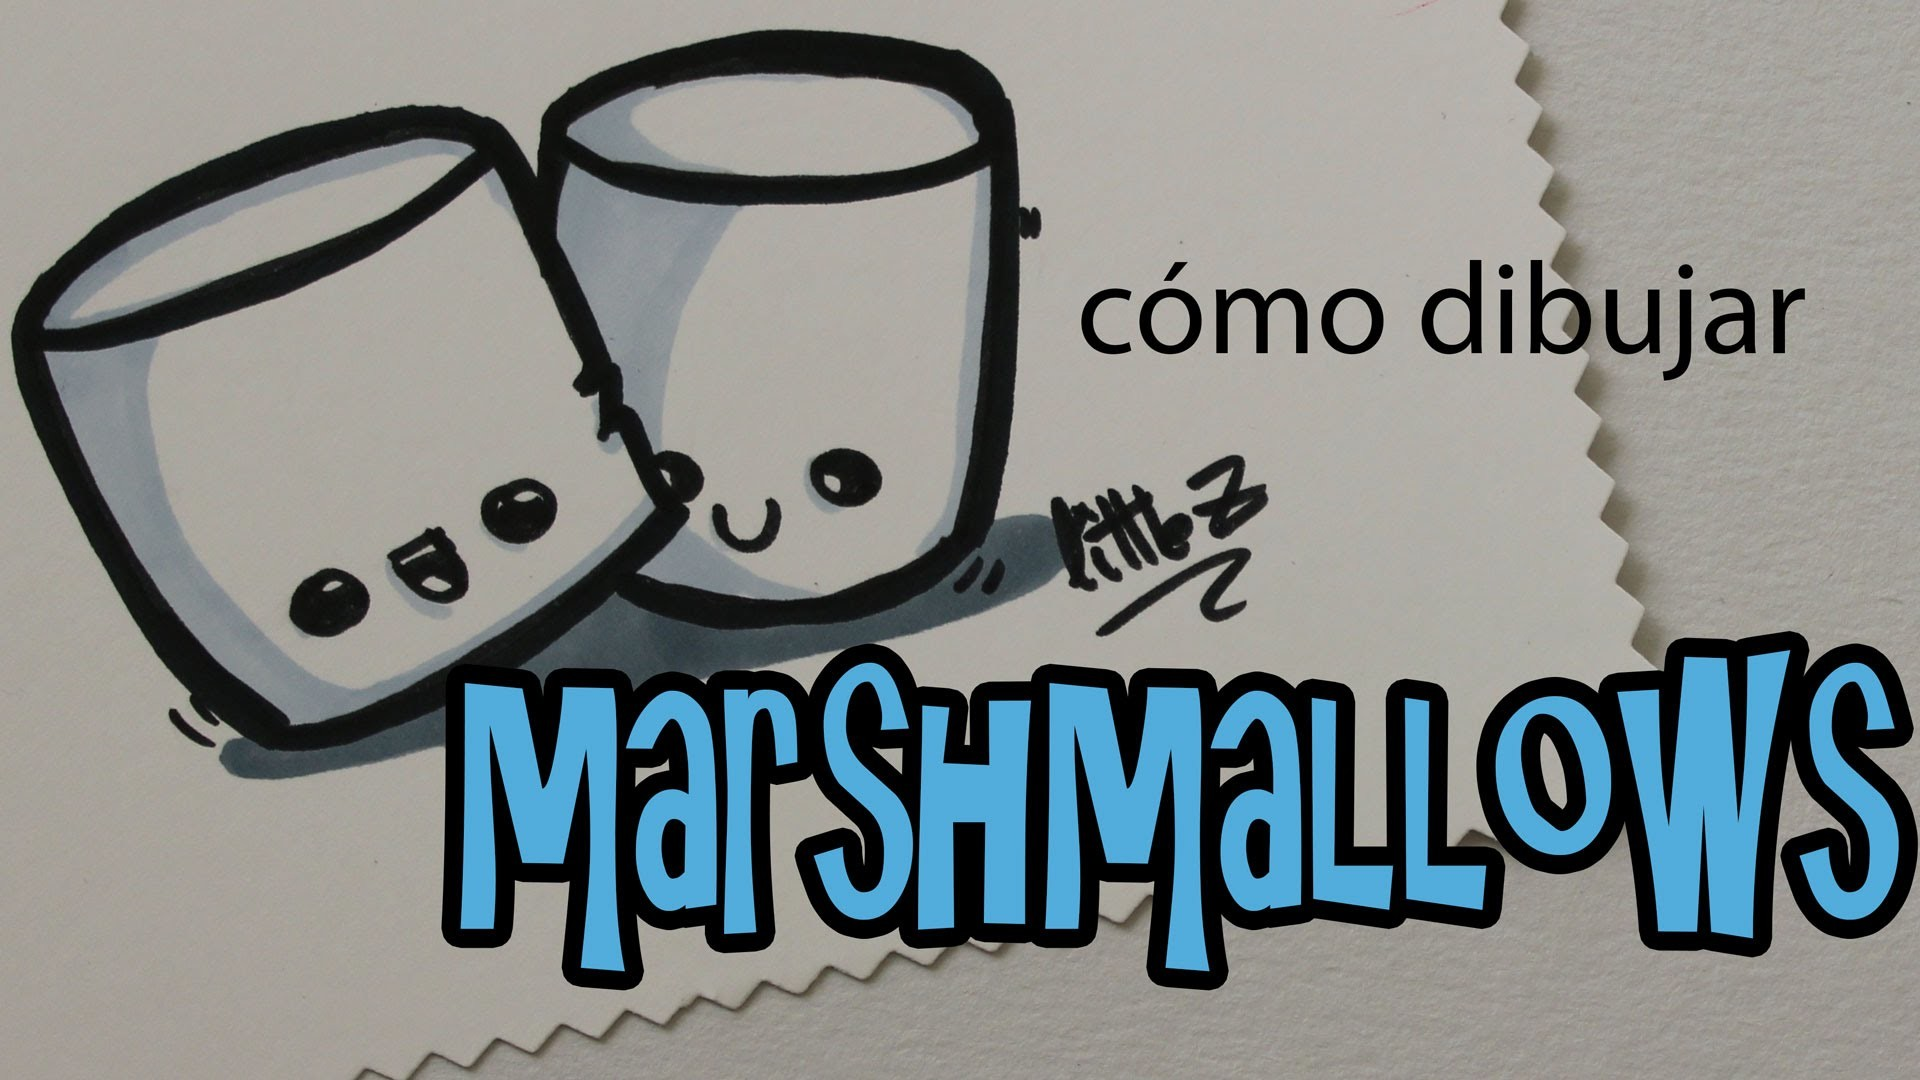 Cómo dibujar nubes o malvaviscos kawaii. How to draw a marshmallows